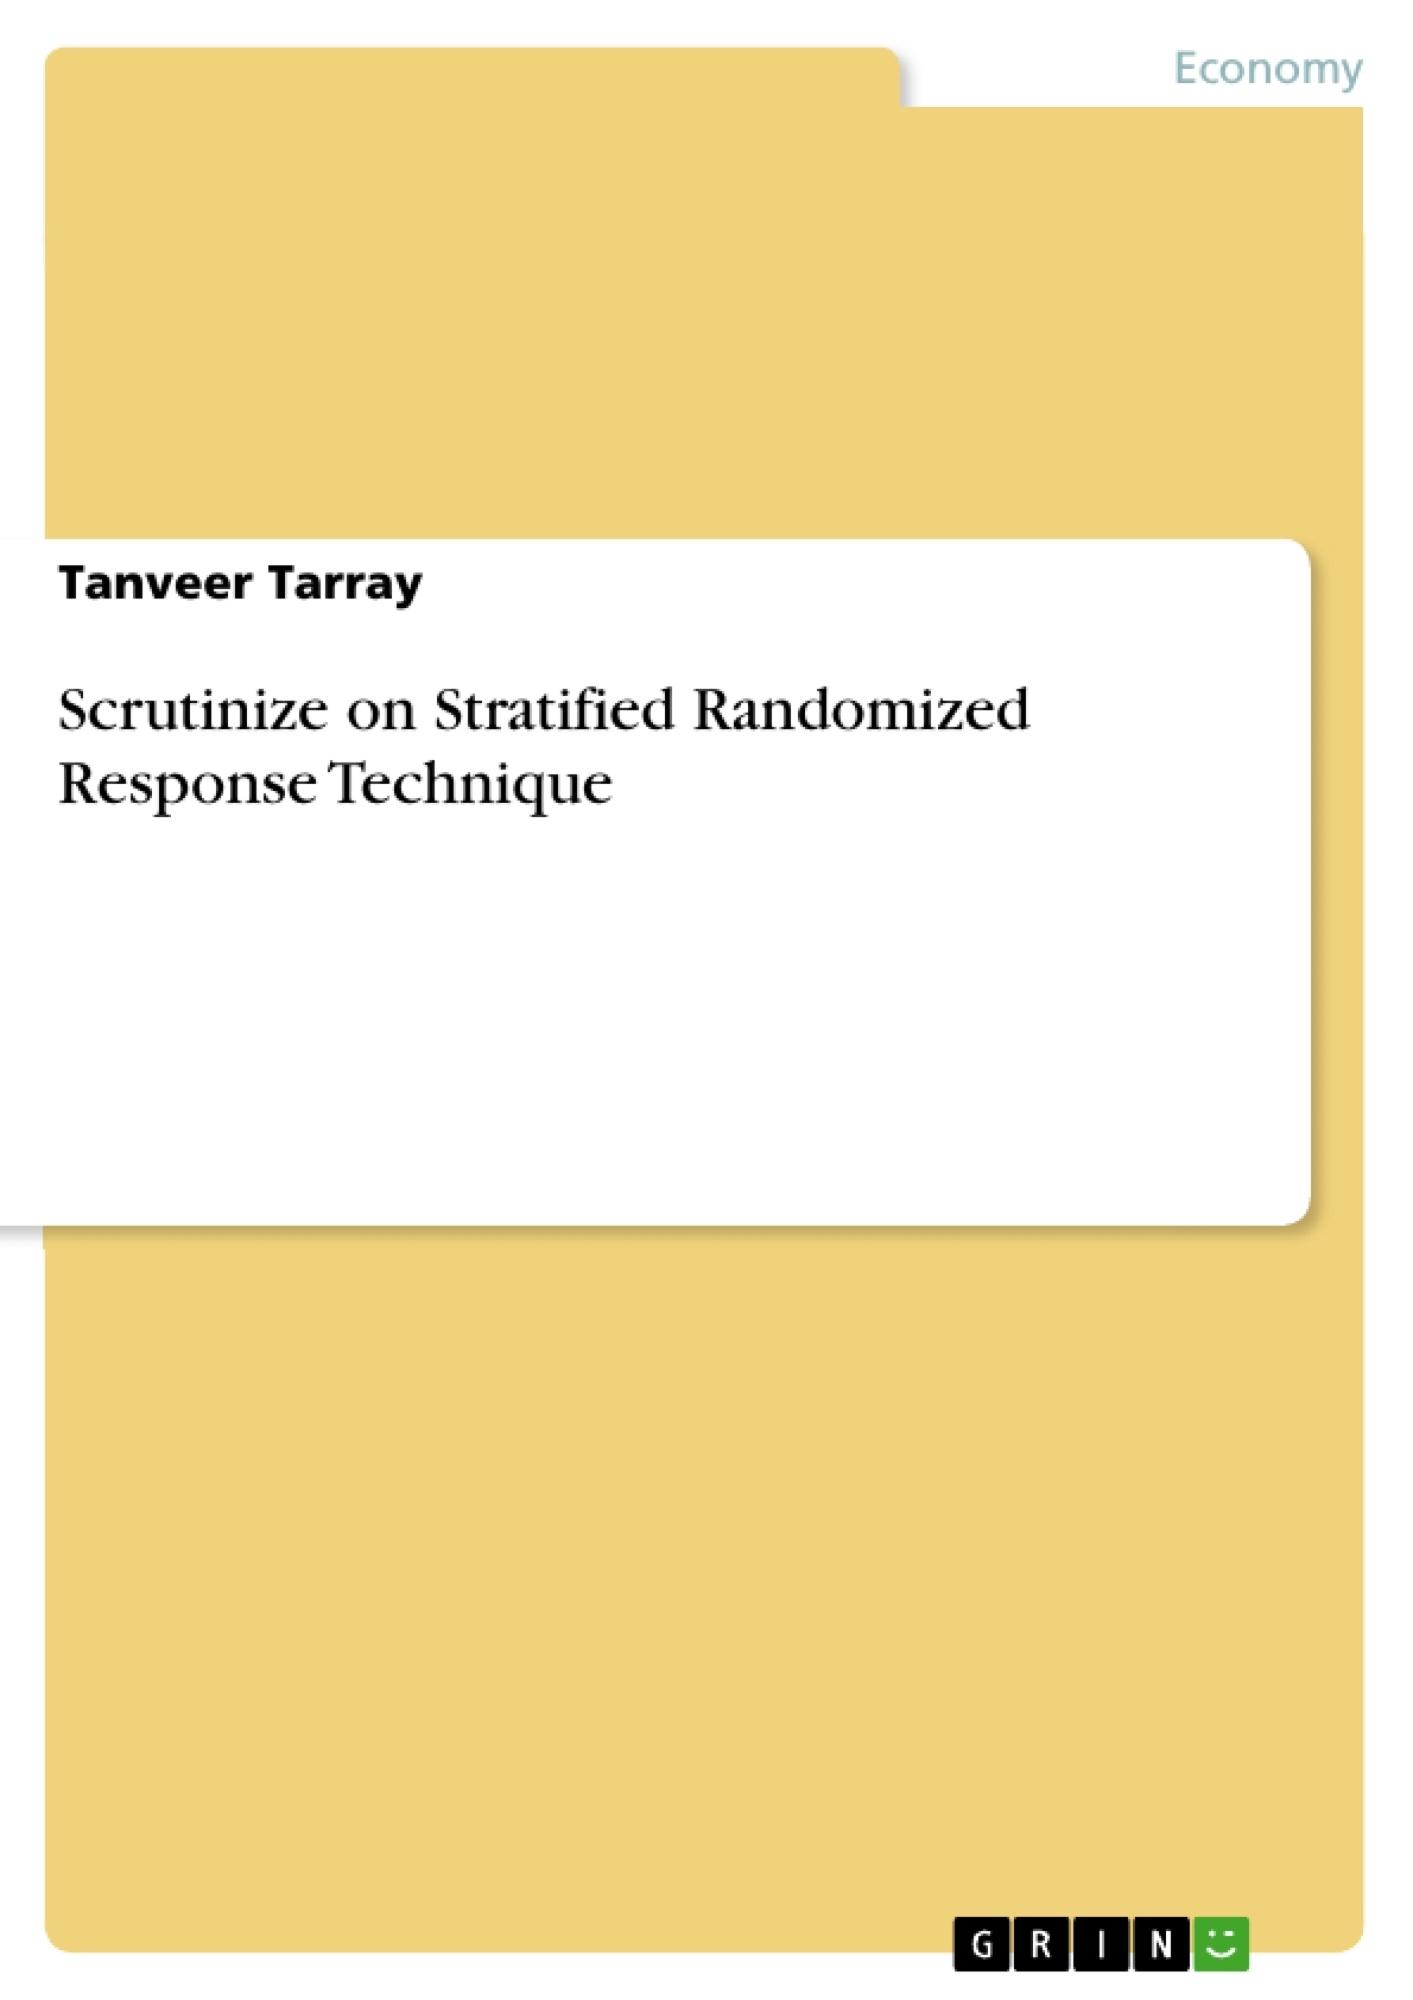 Title: Scrutinize on Stratified Randomized Response Technique